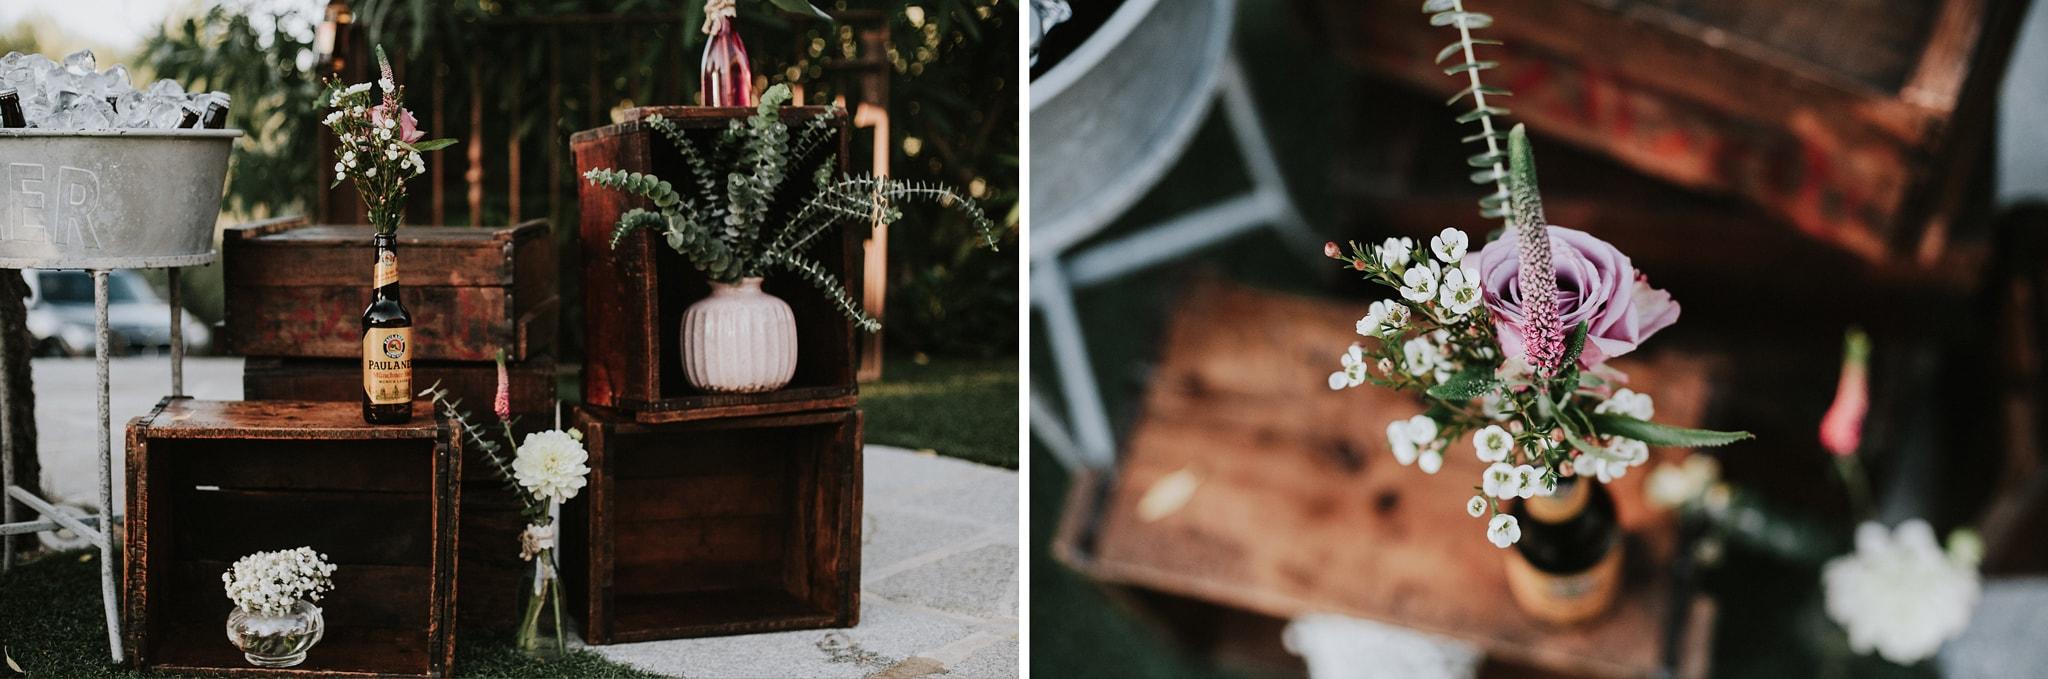 prisma-blanco-fotografos-bodas-toledo-111